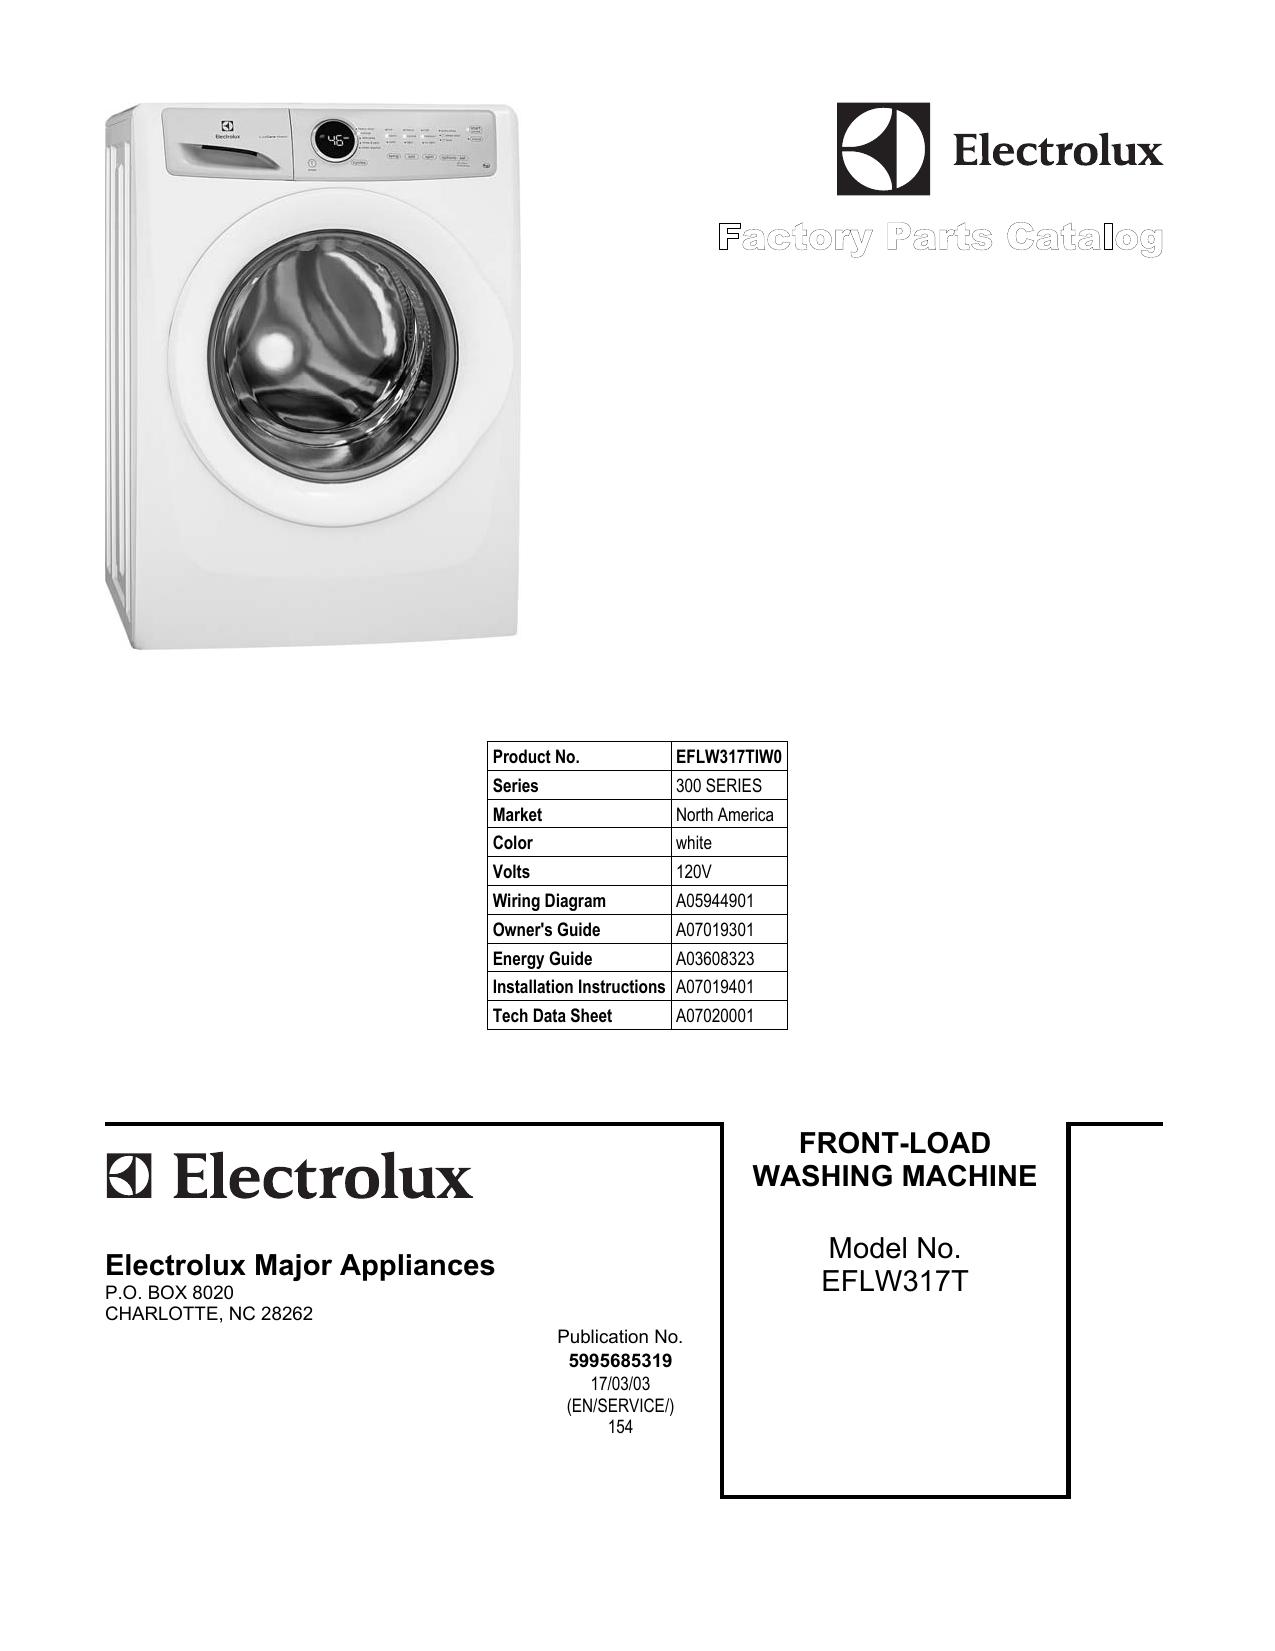 Electrolux EFLW317TIW Parts Manual | manualzz.com on